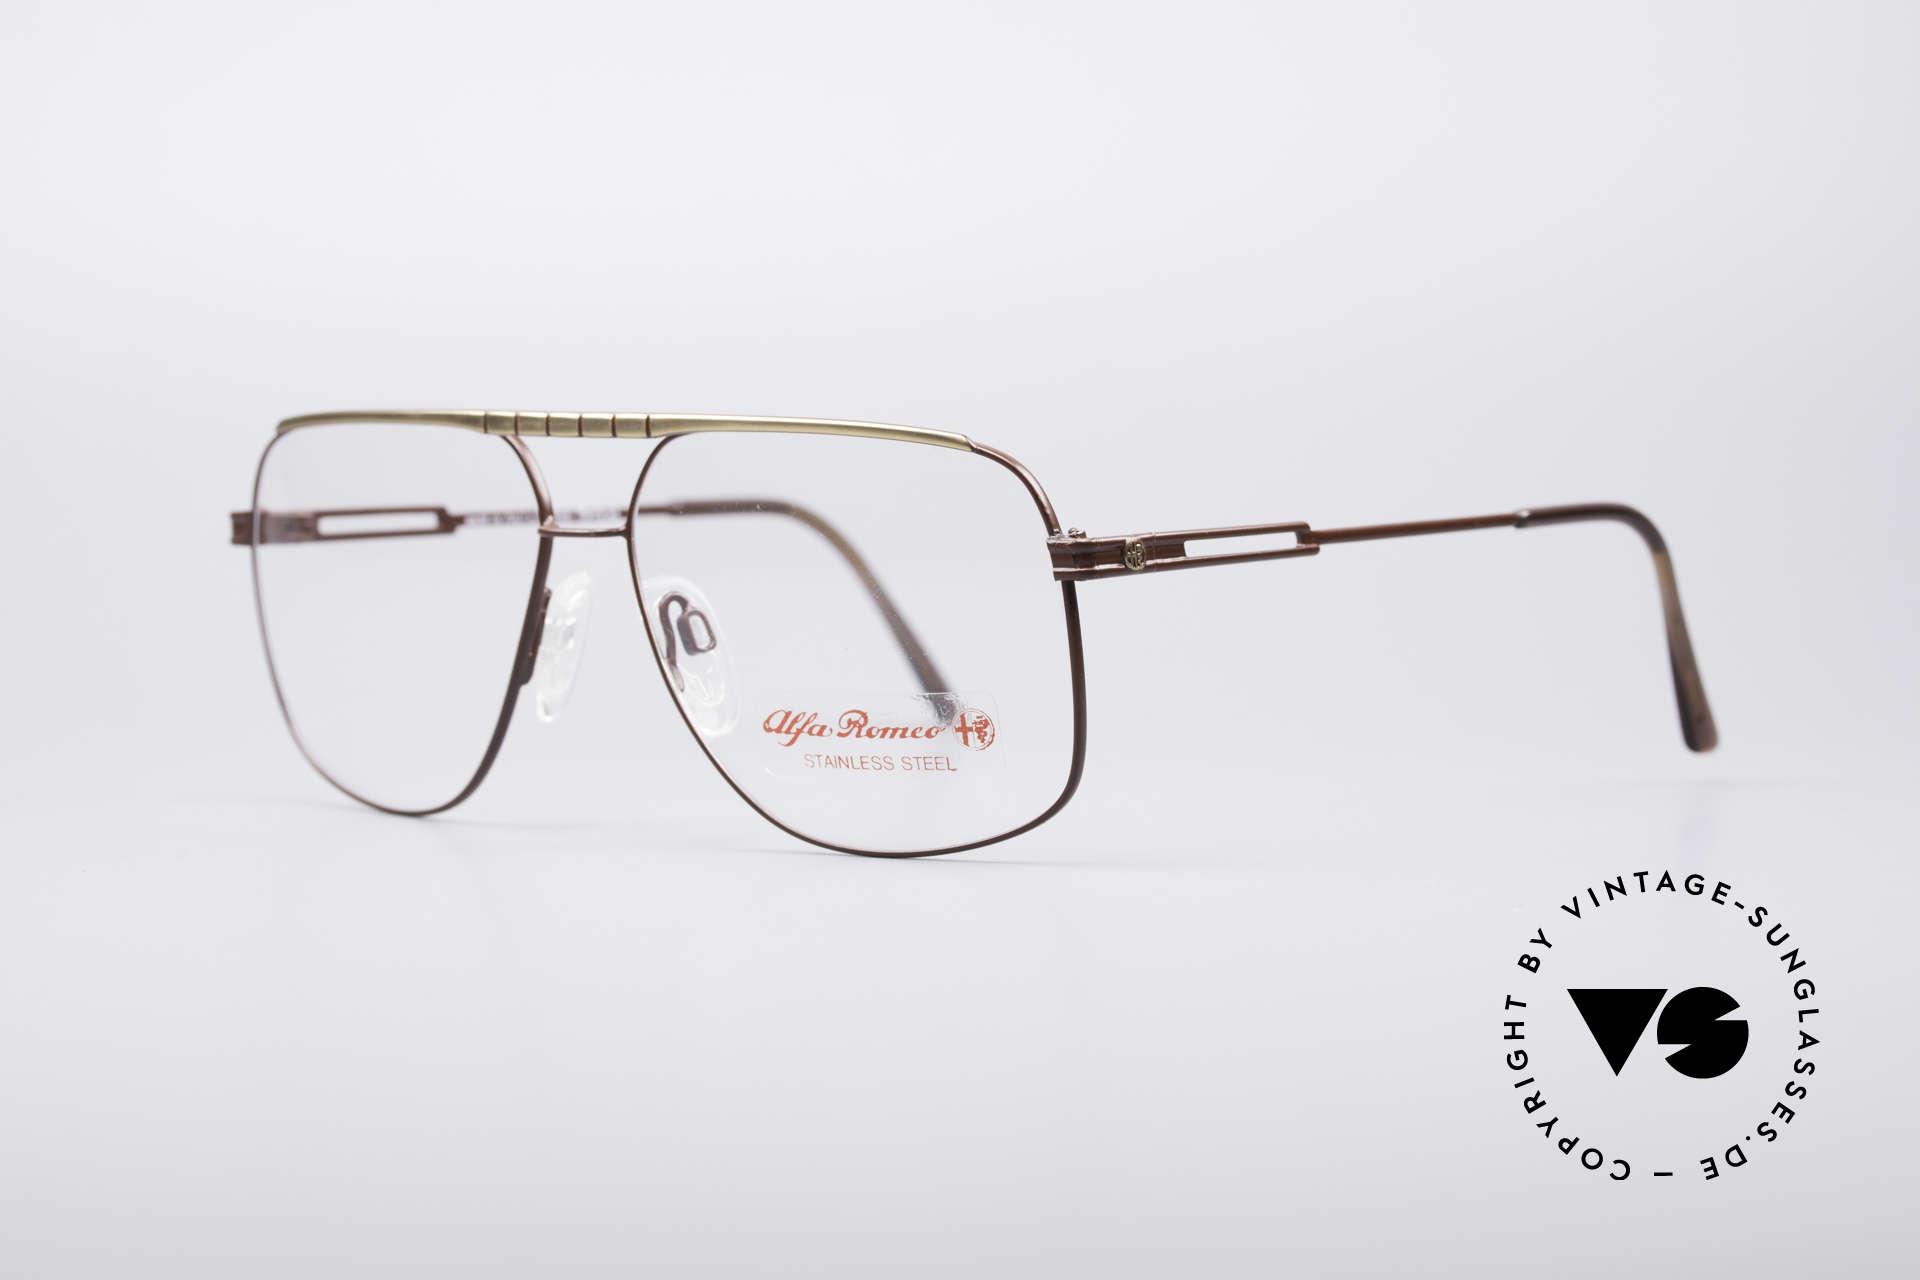 Alfa Romeo 60-252 80's Vintage Glasses, stylish frame varnishing (a kind of auburn with gold), Made for Men